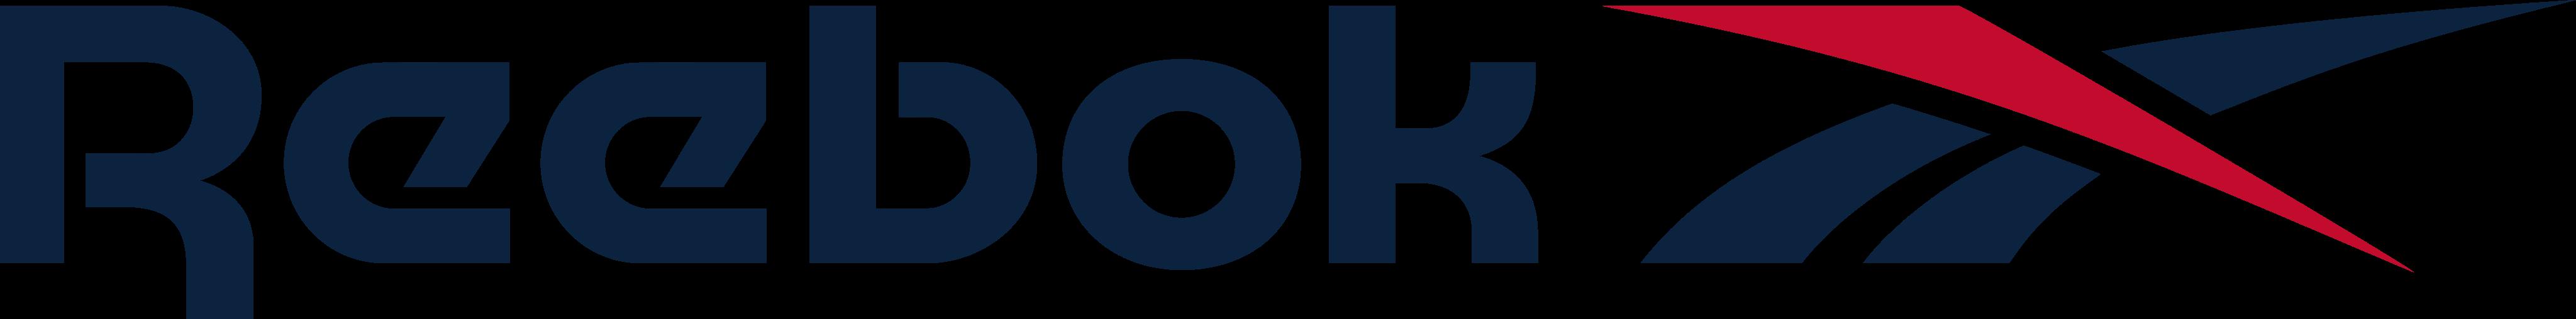 reebok logo - Reebok Logo